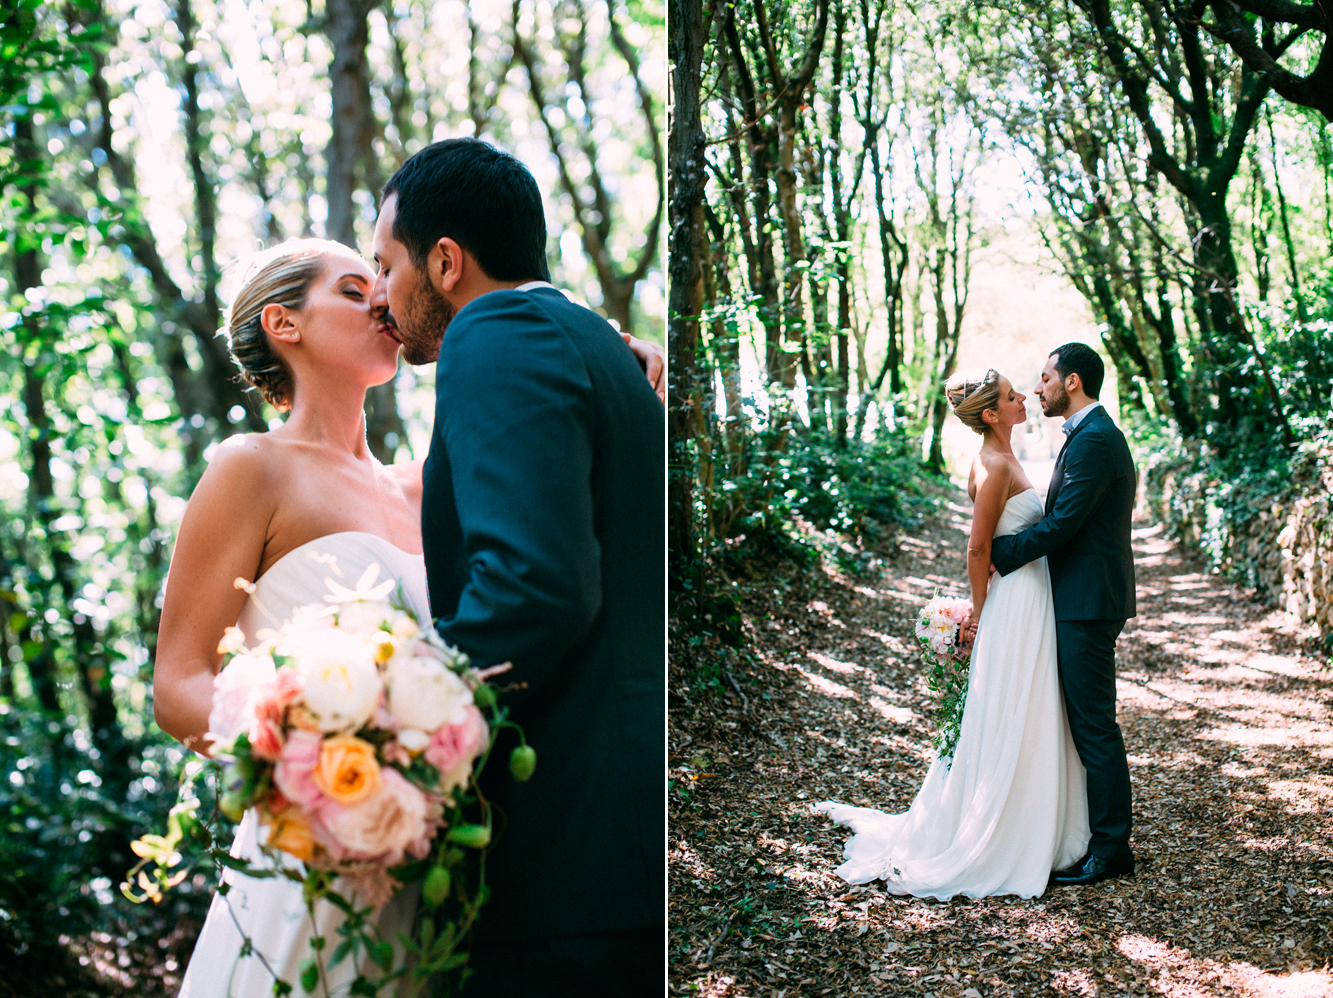 184-bride groom wedding portrait photographer marche conero.jpg